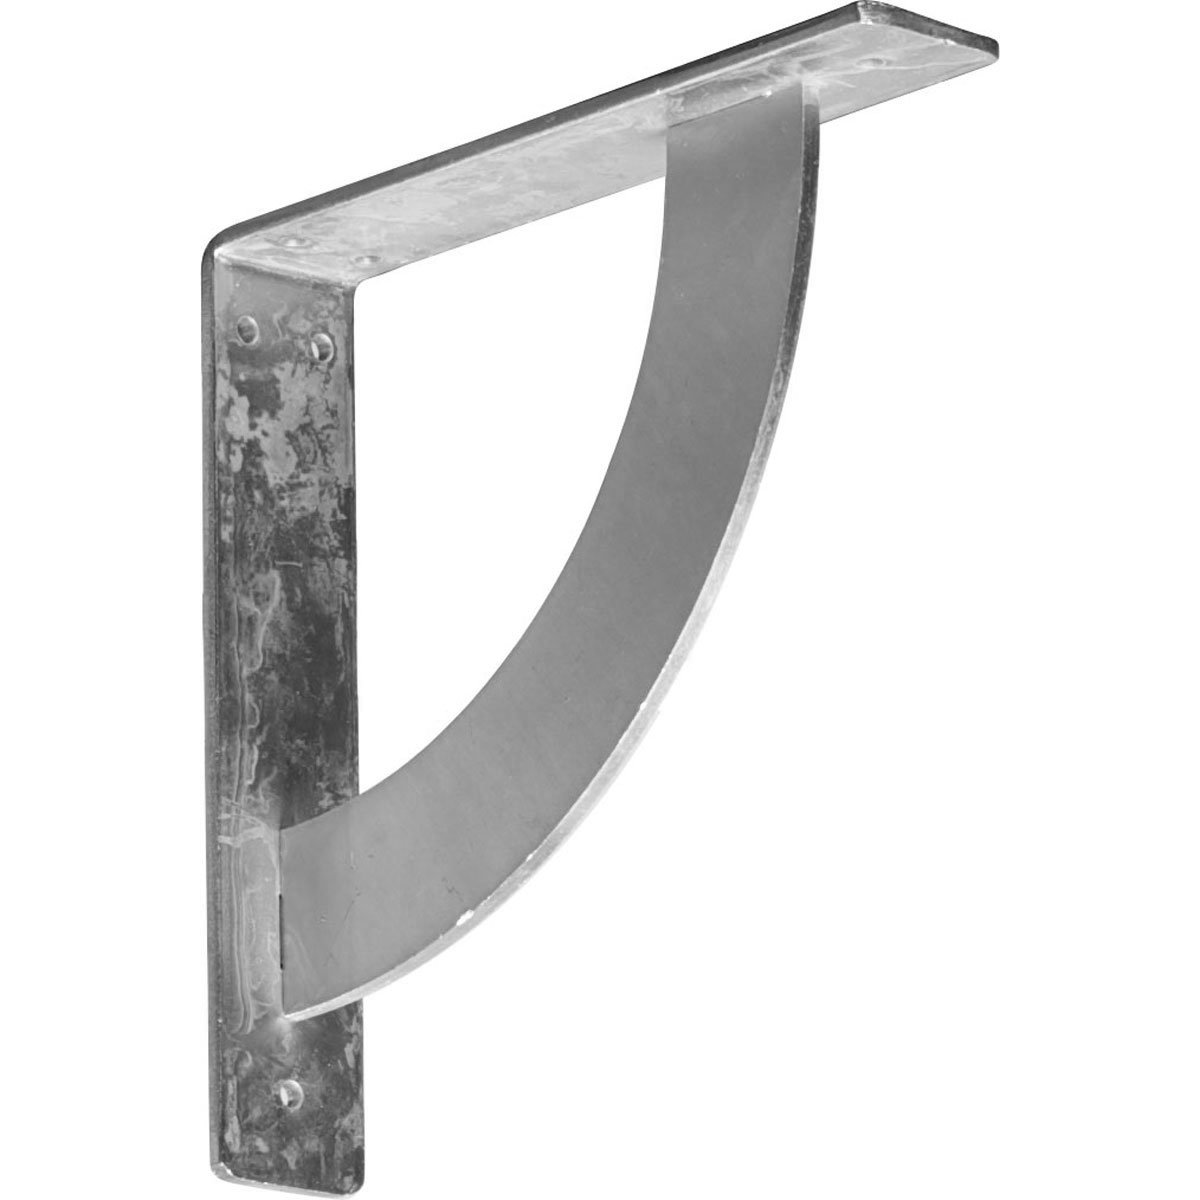 Steel Ekena Millwork BKTM02X10X10BUCRS-CASE-6 2 W D x 10 H Bulwark Bracket 6-Pack Piece